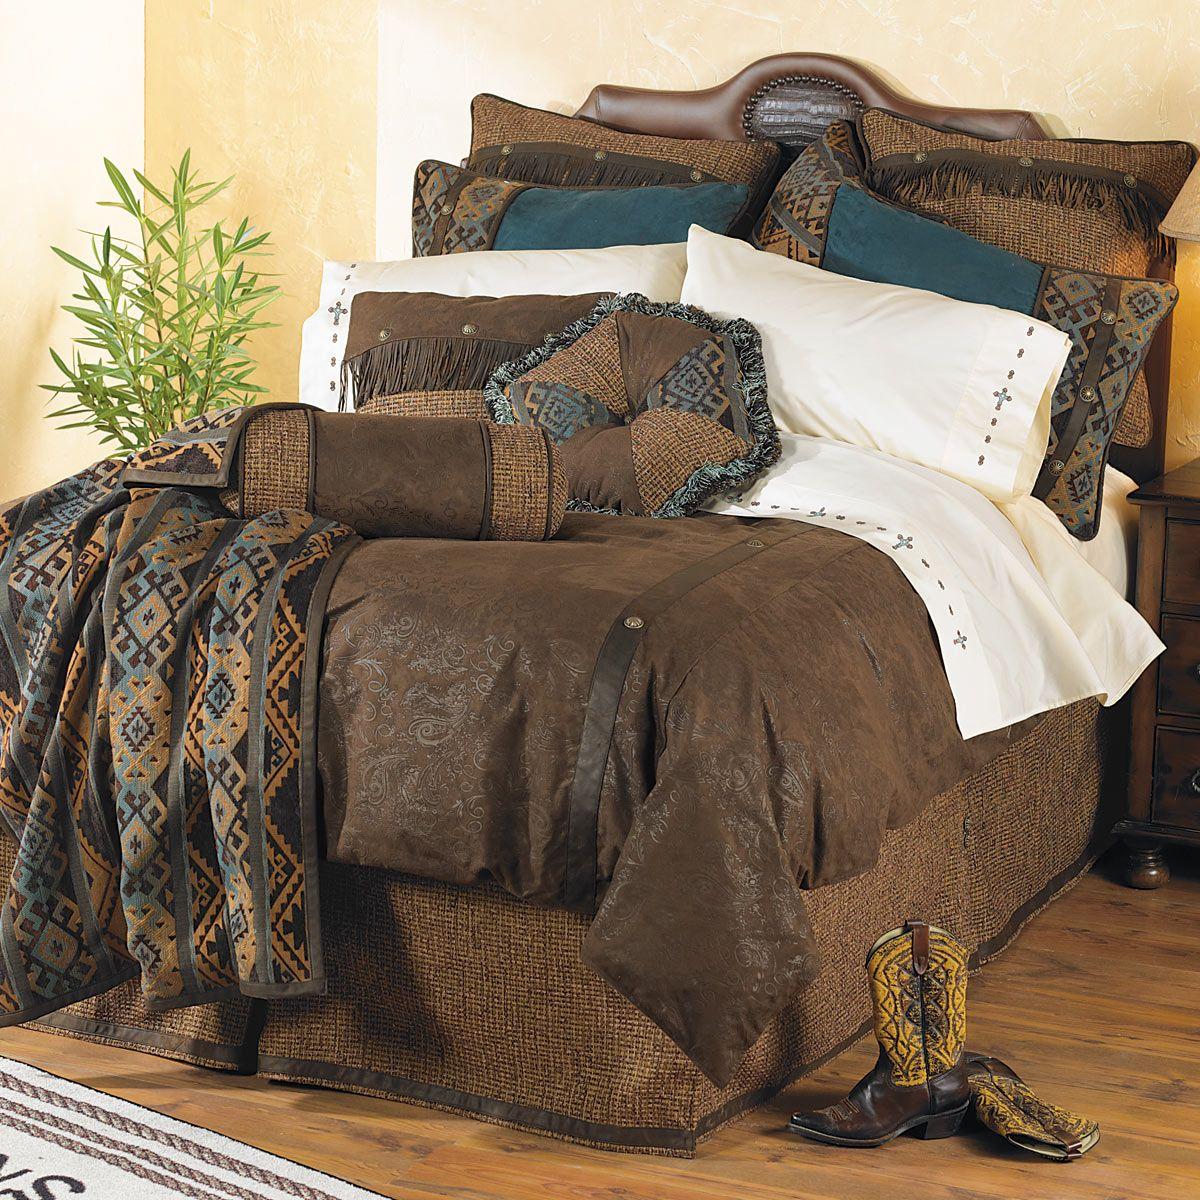 Best Del Rio Bed Set Twin Bedding Sets Rustic Bedding 400 x 300